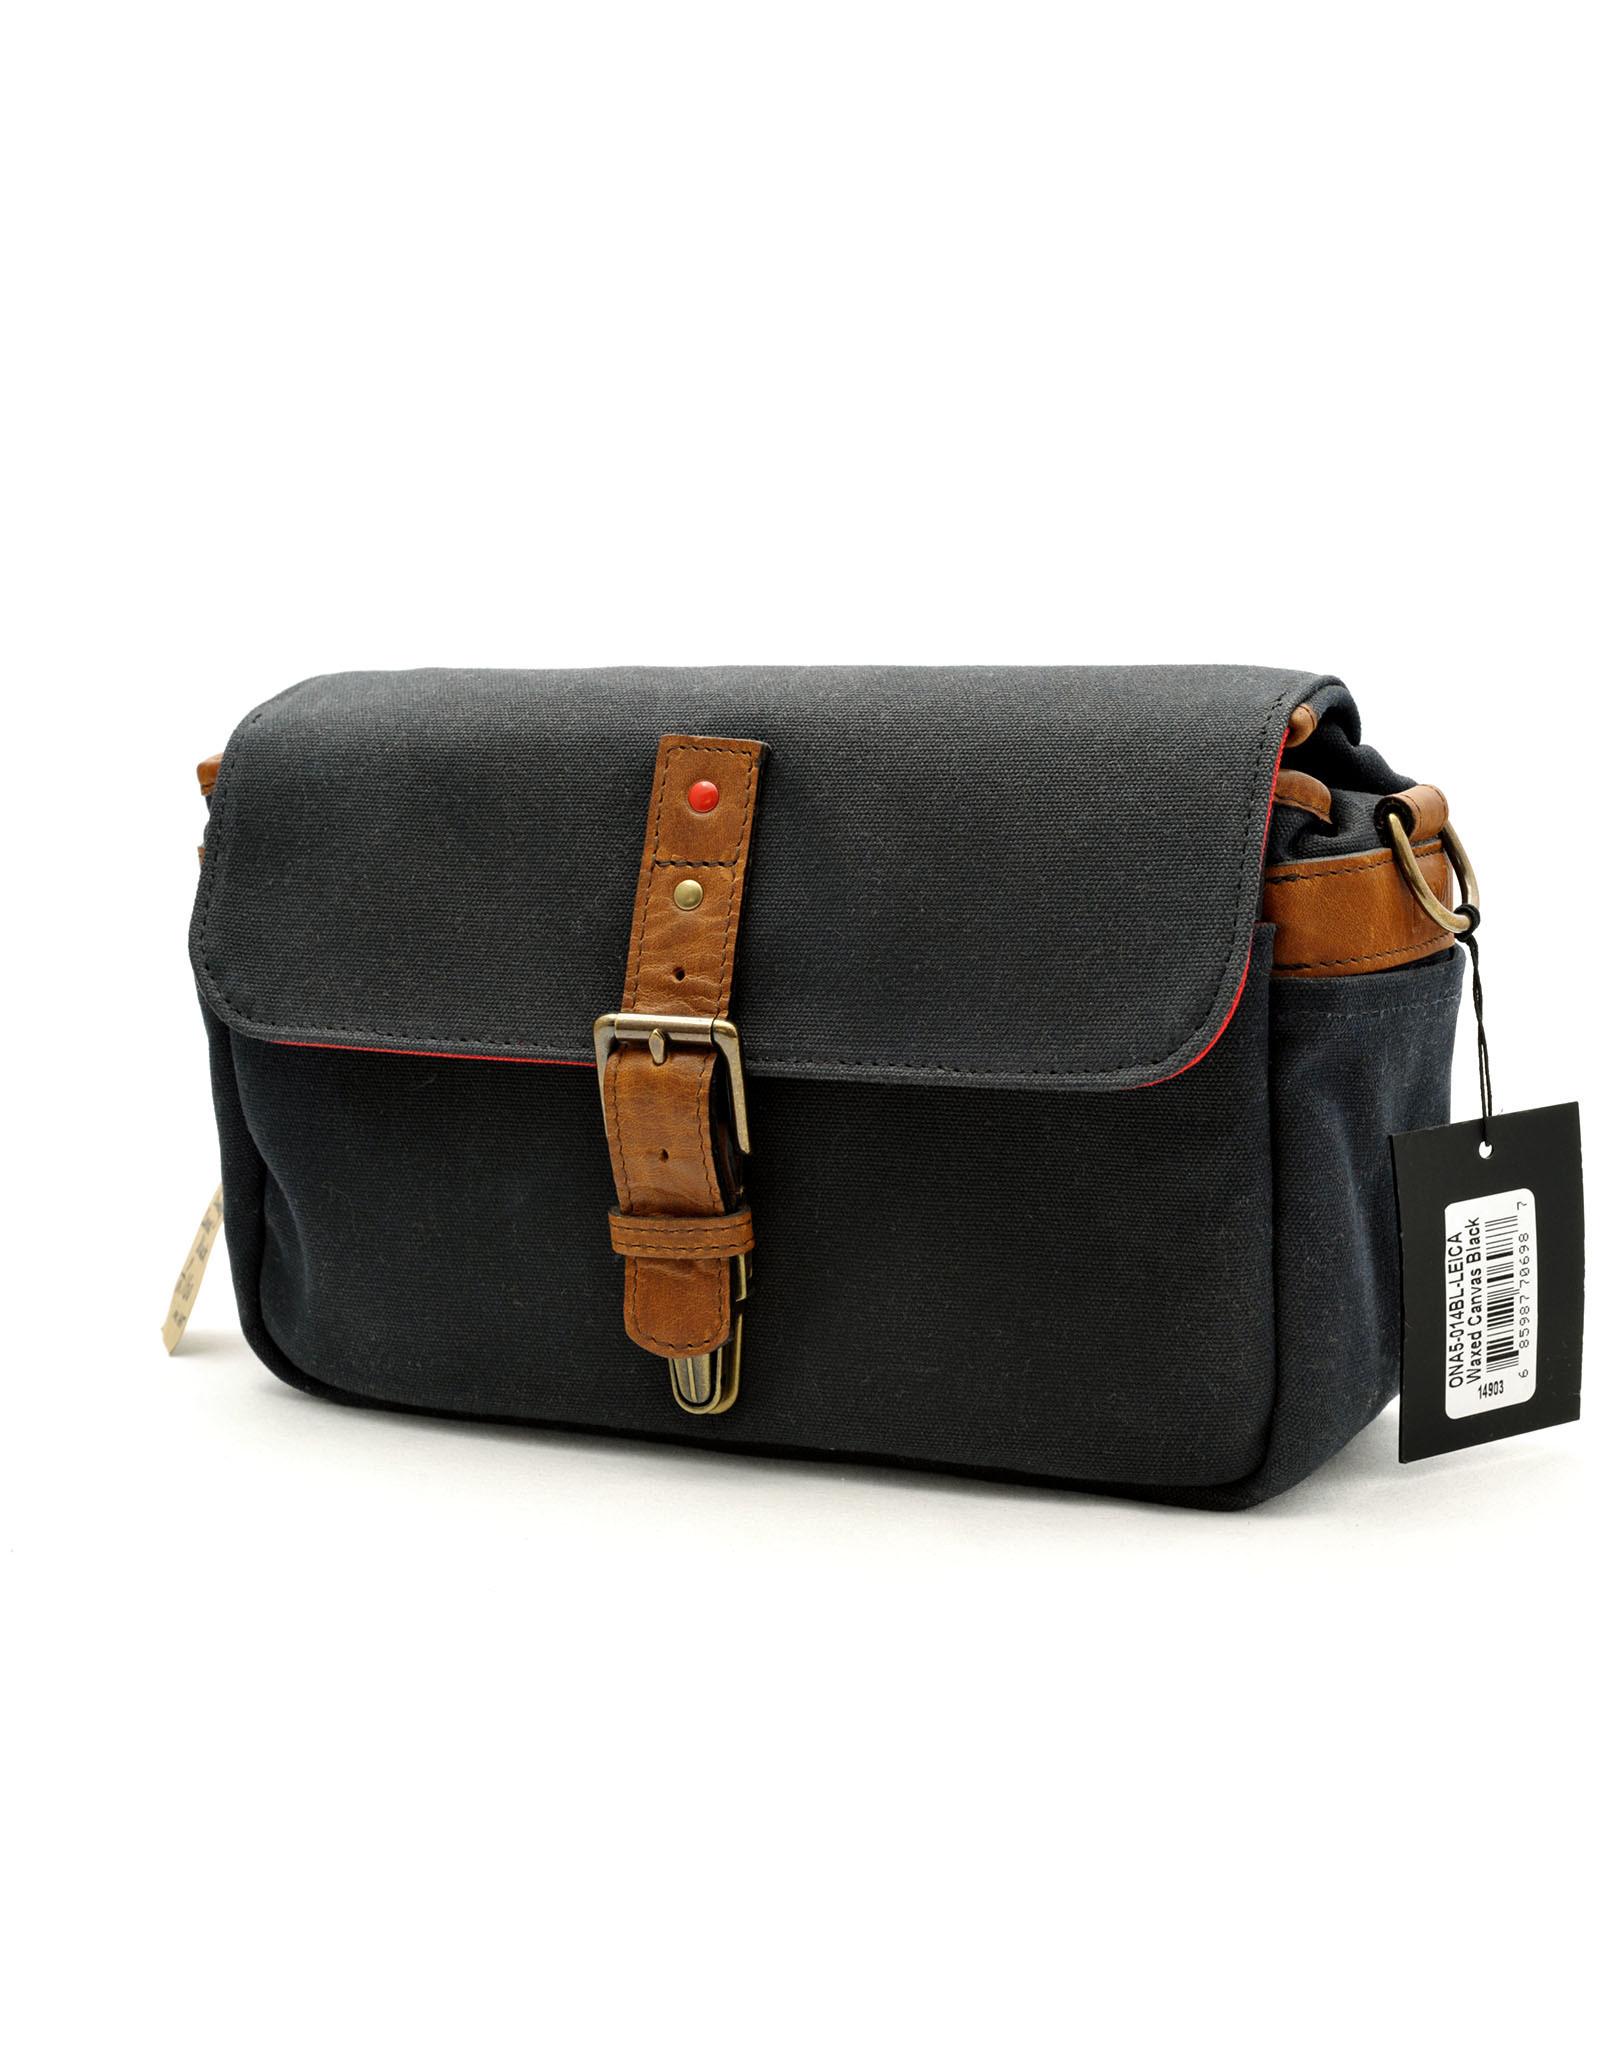 Leica ONA Bag Bowery for Leica Canvas Black   149-03